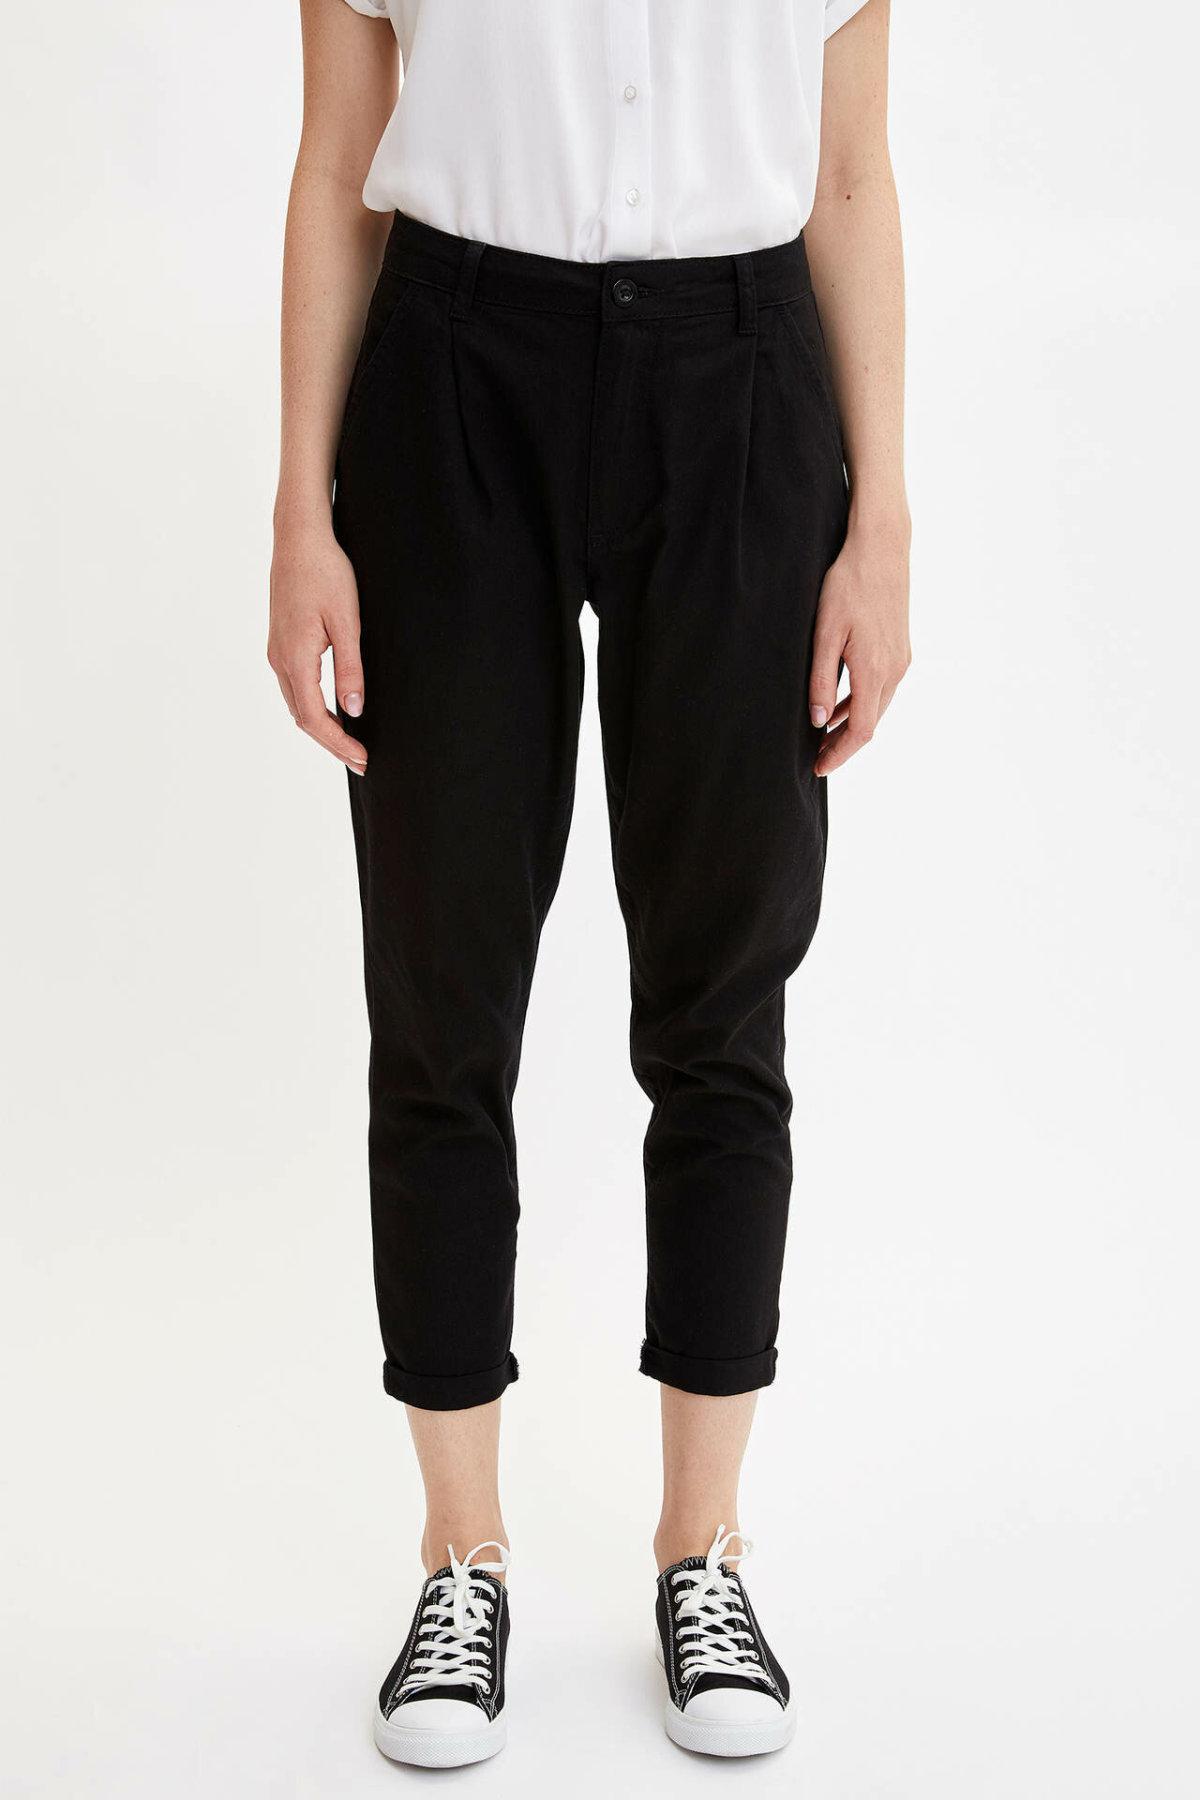 DeFacto Woman Summer Black Casual Ninth Pants Women Fashion Loose Bottoms Female Harem Pants Trousers-L6440AZ19SM